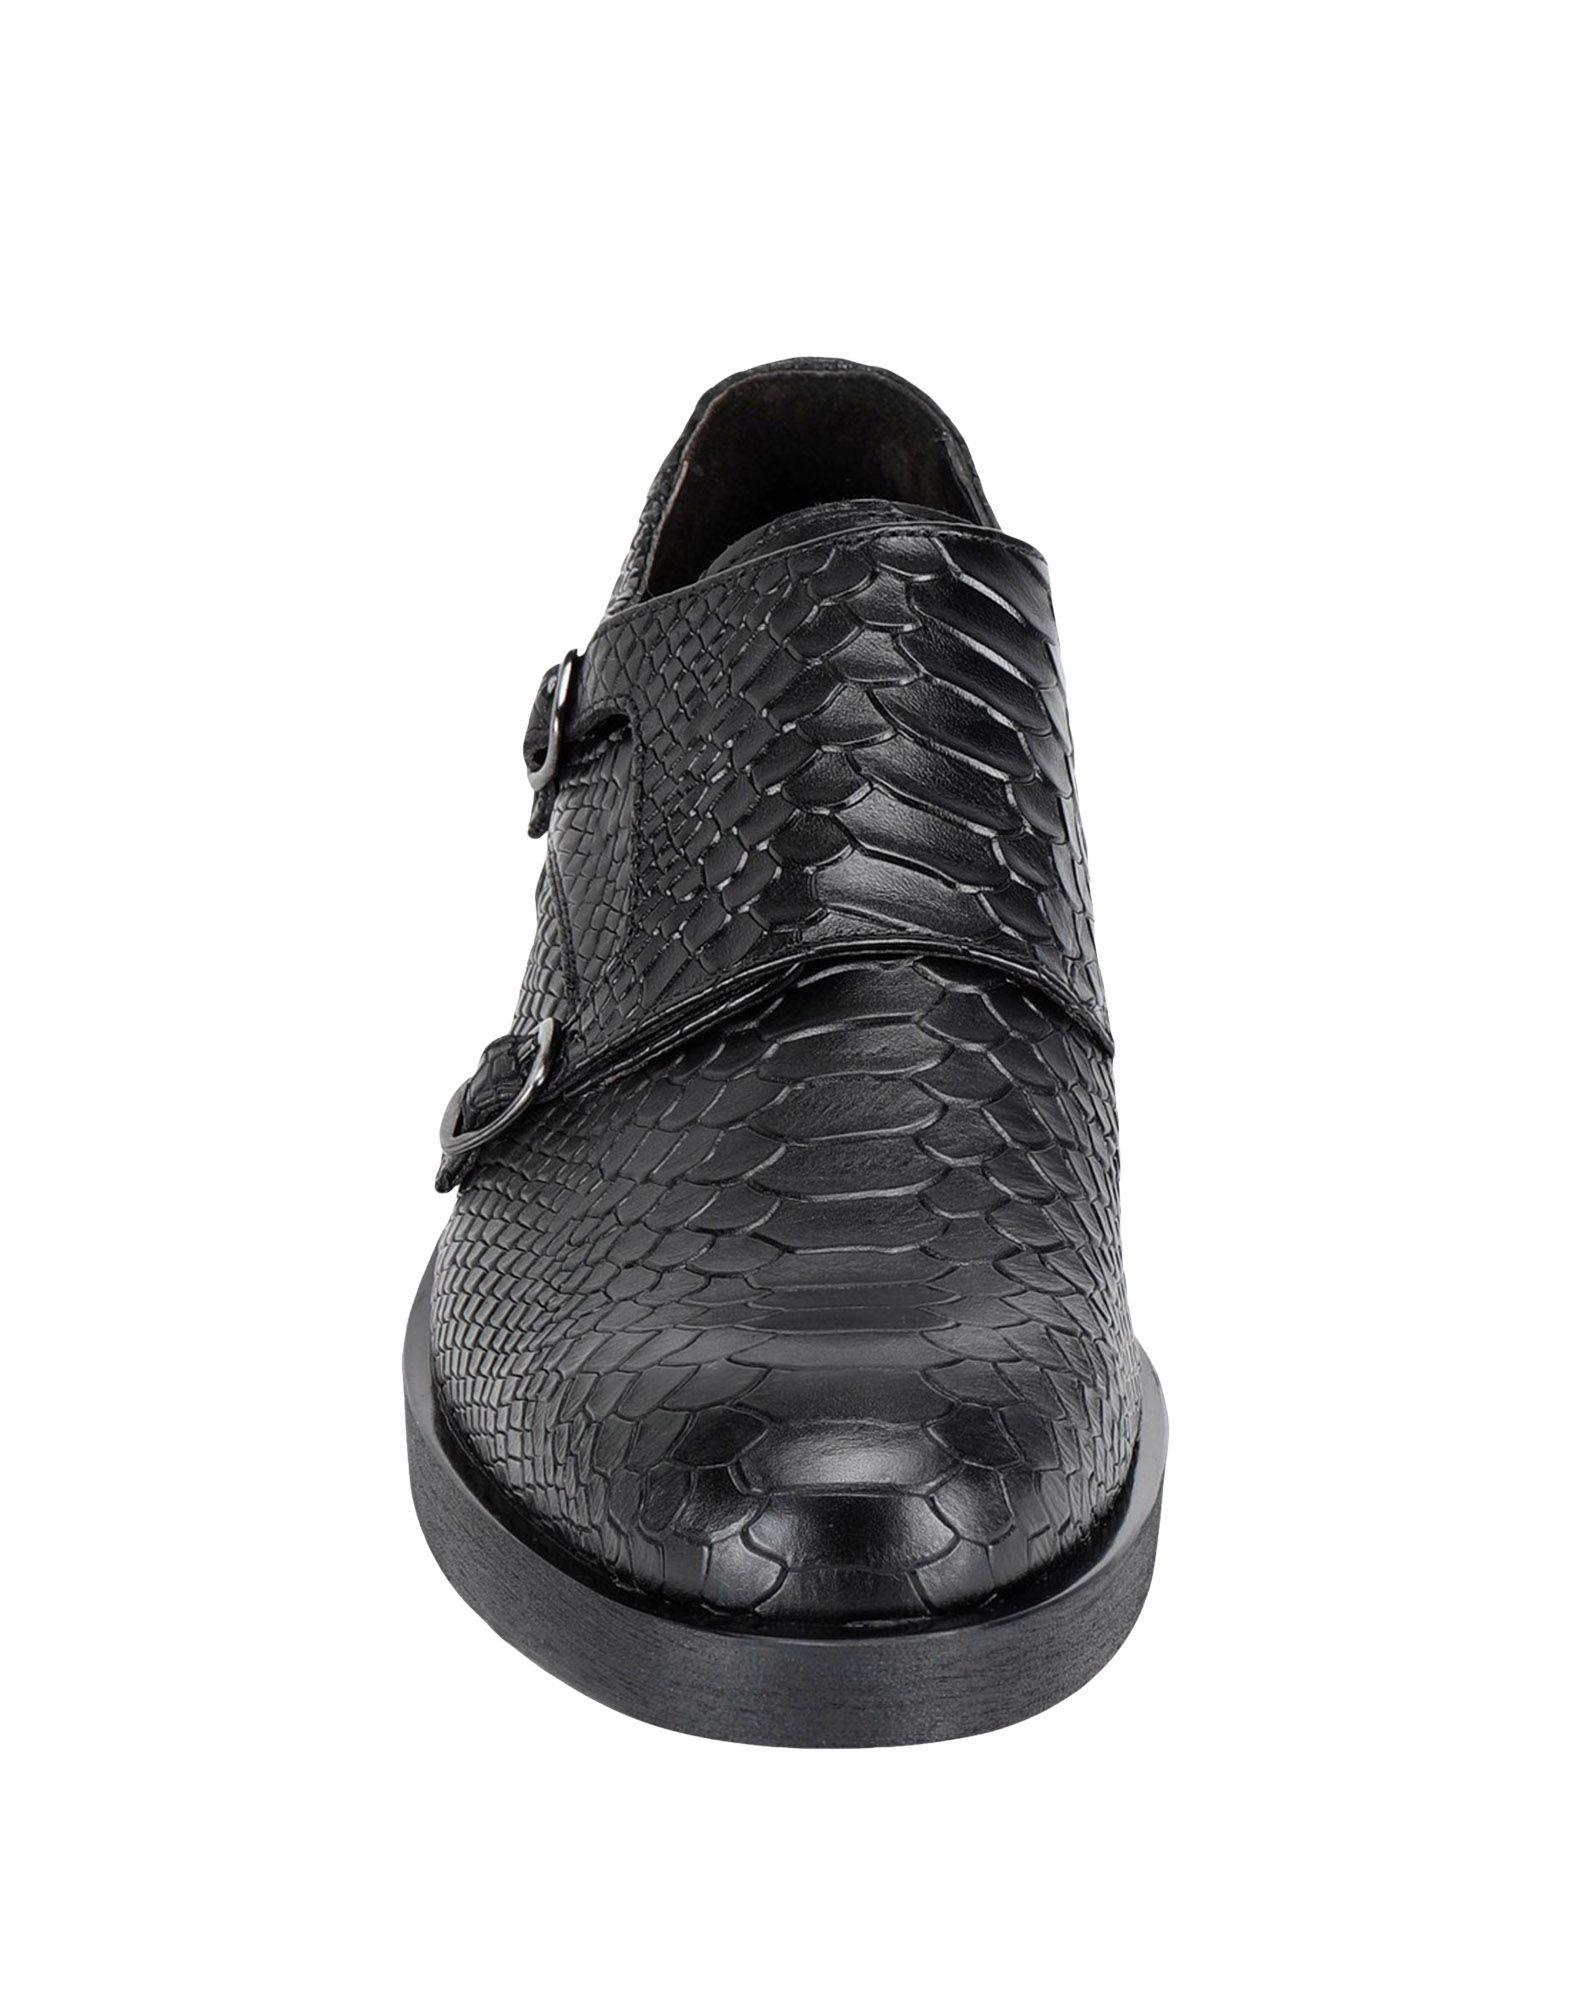 Mckanty Mokassins Herren  11536060TC Gute Qualität beliebte Schuhe